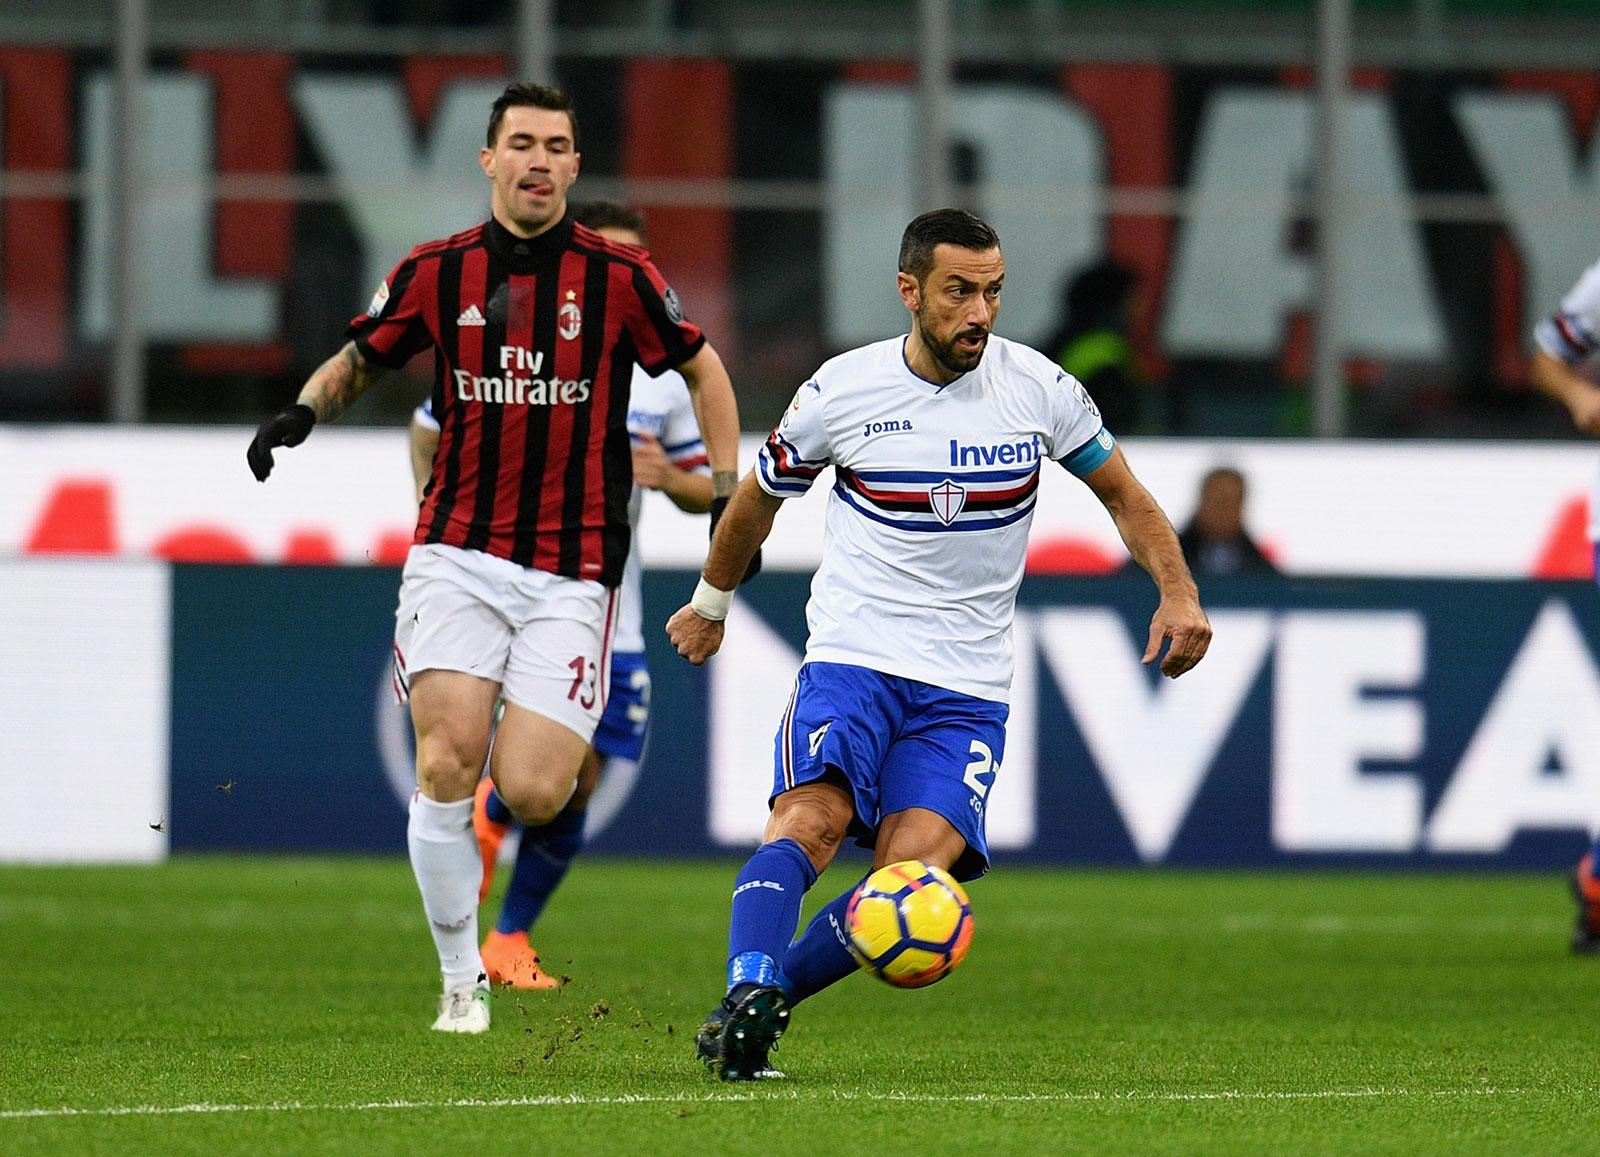 Fabio Quagliarella and Alessio Romagnoli during Milan-Sampdoria at Stadio San Siro on February 18, 2018. (Photo by Claudio Villa/Getty Images)